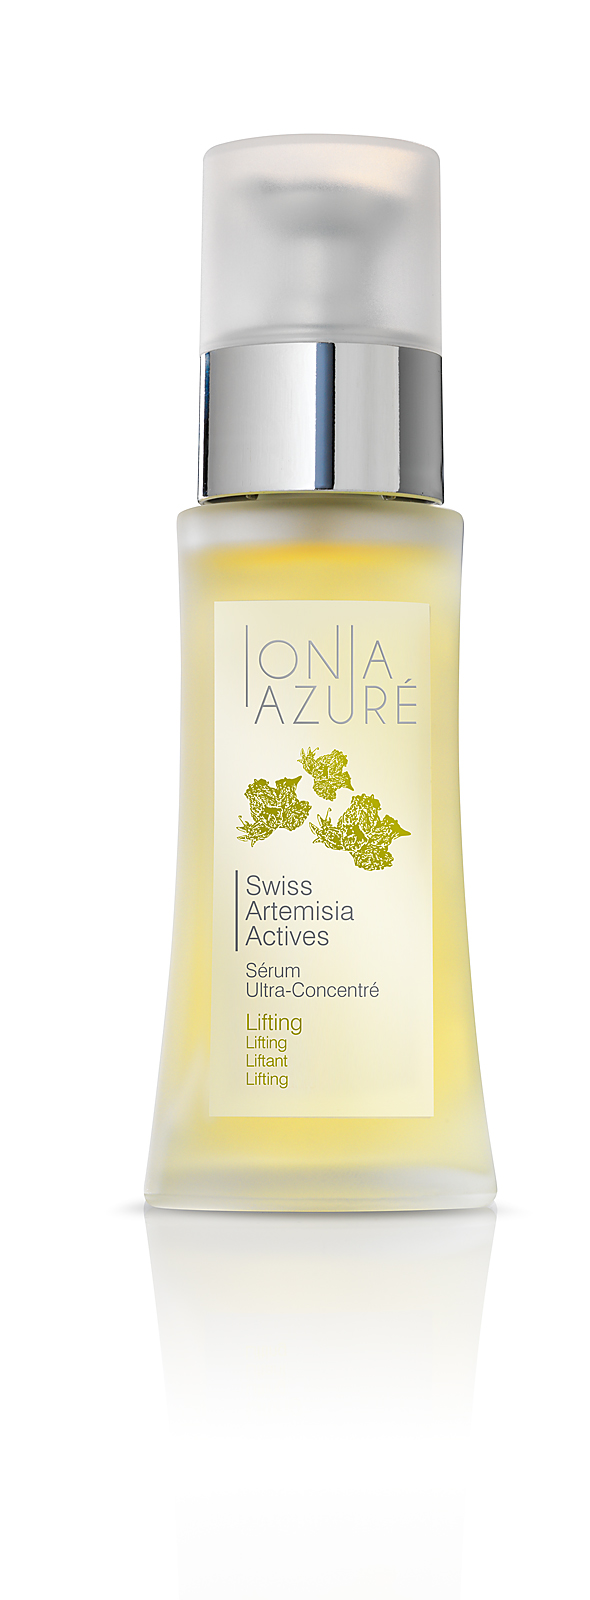 Swiss Artemisia Actives